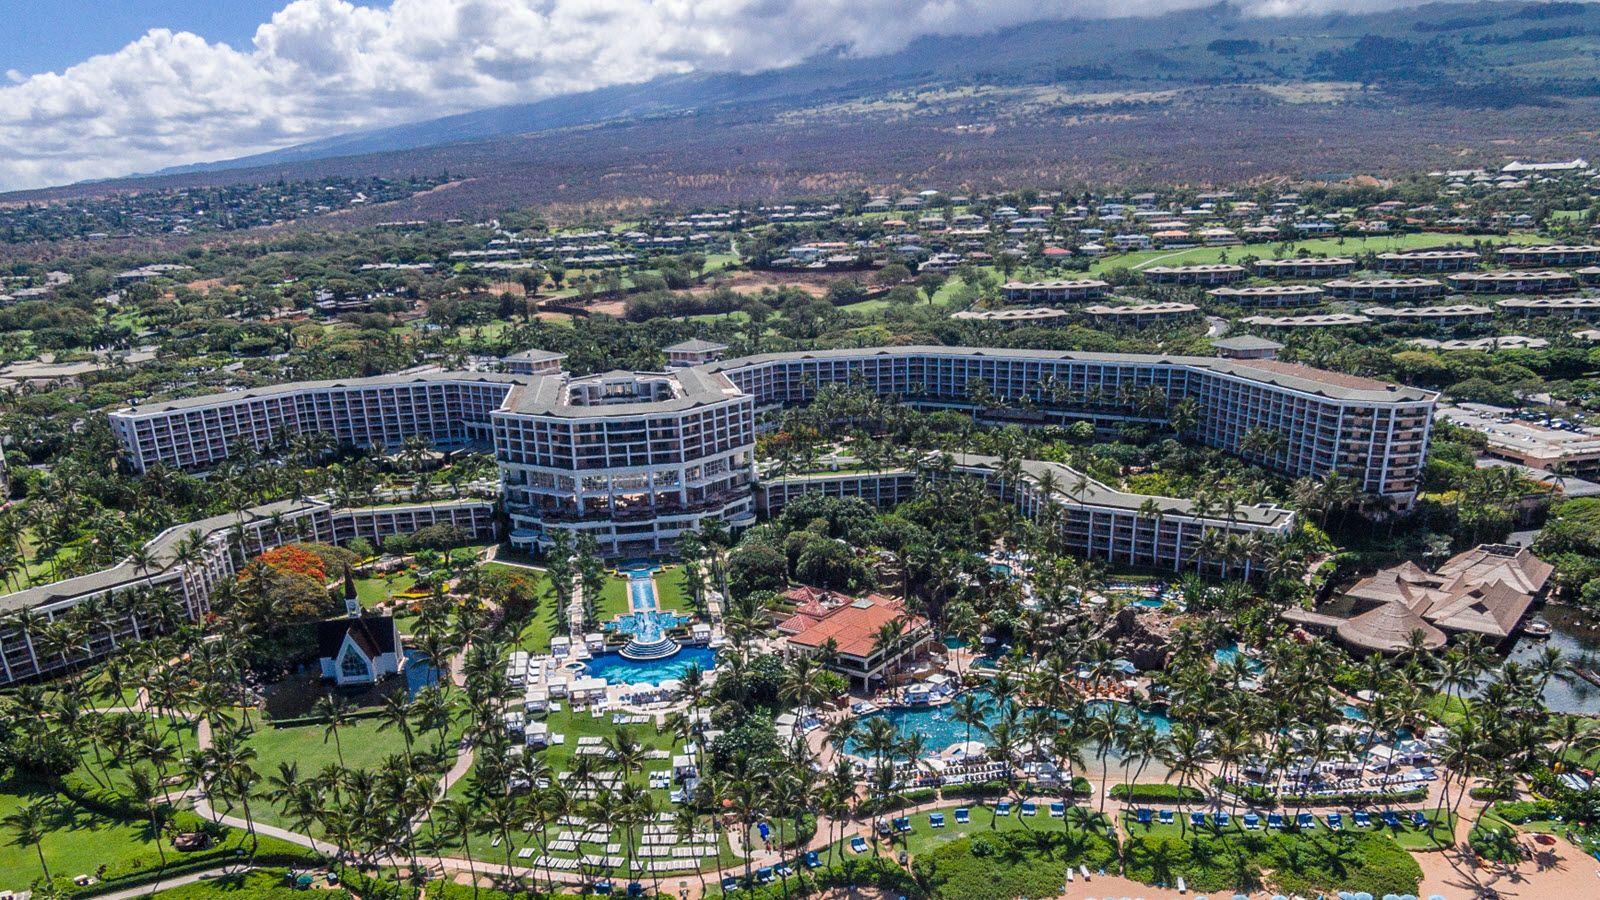 Aerial Photos Of Grand Wailea Via Grand Wailea Maui Hawaii Maui Hotels Maui Photos Wailea Maui